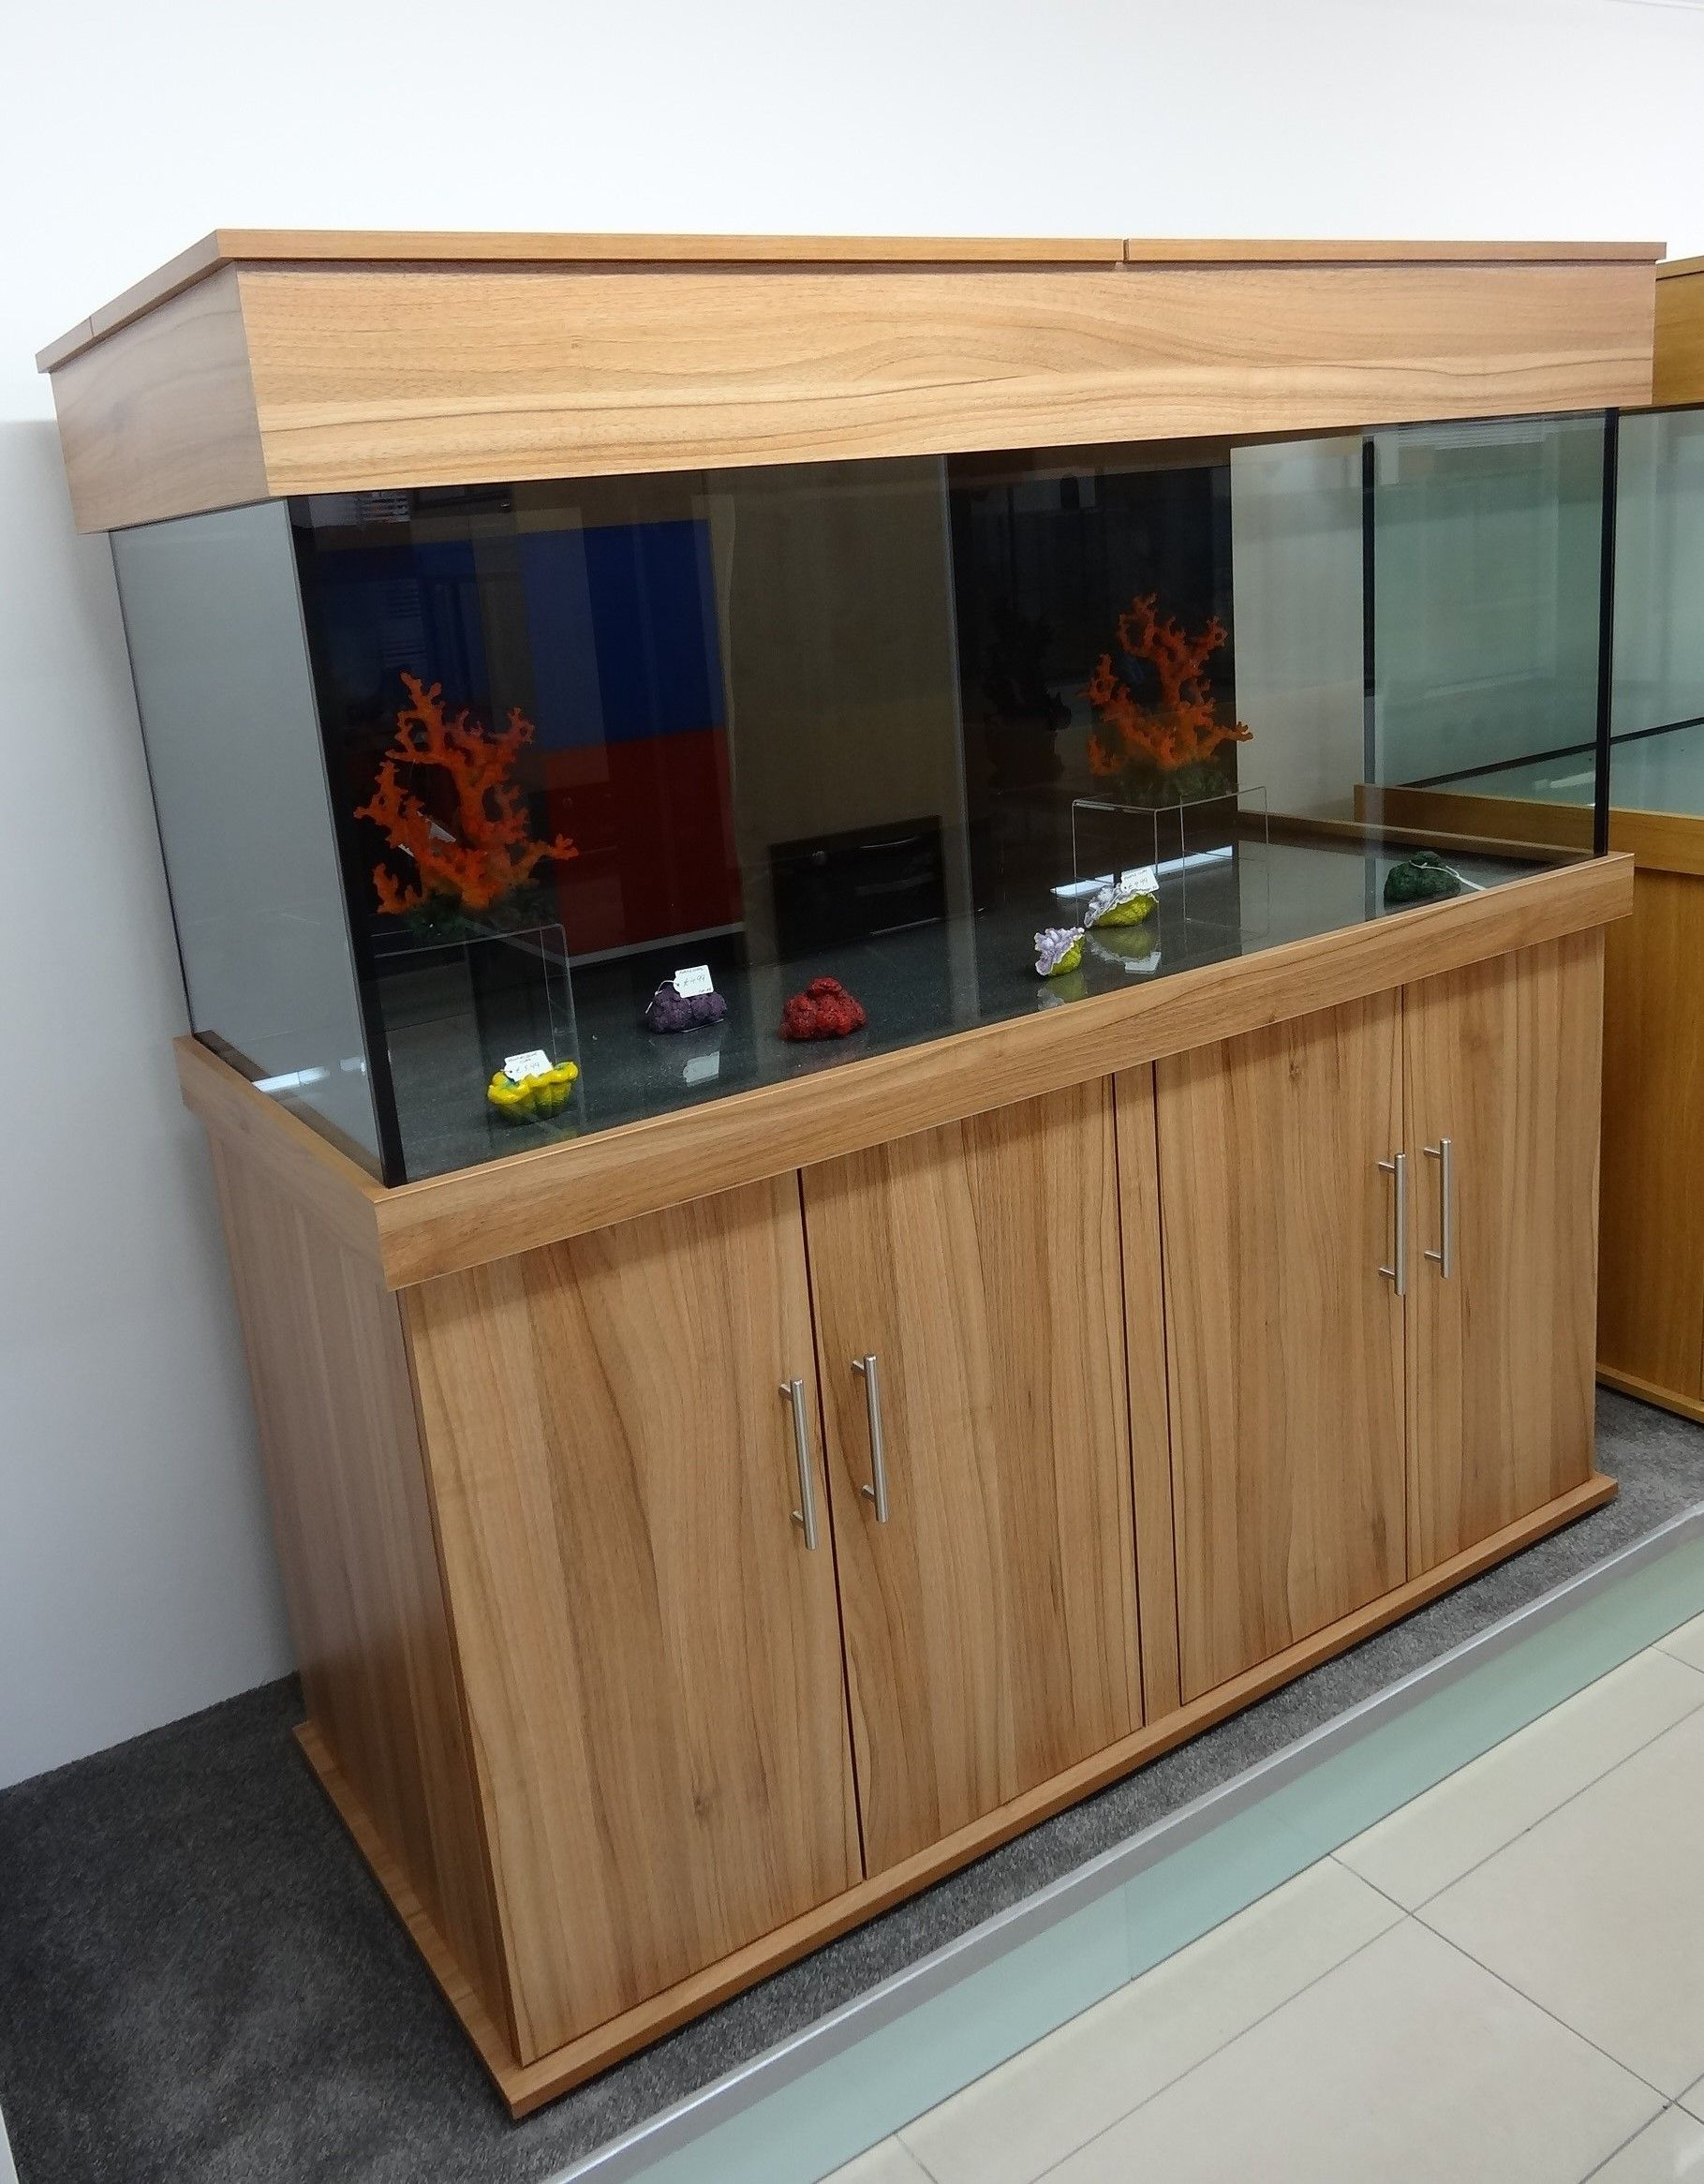 marine fish tank 60 x24 x24 with weir and sump tank 43 x18 x17